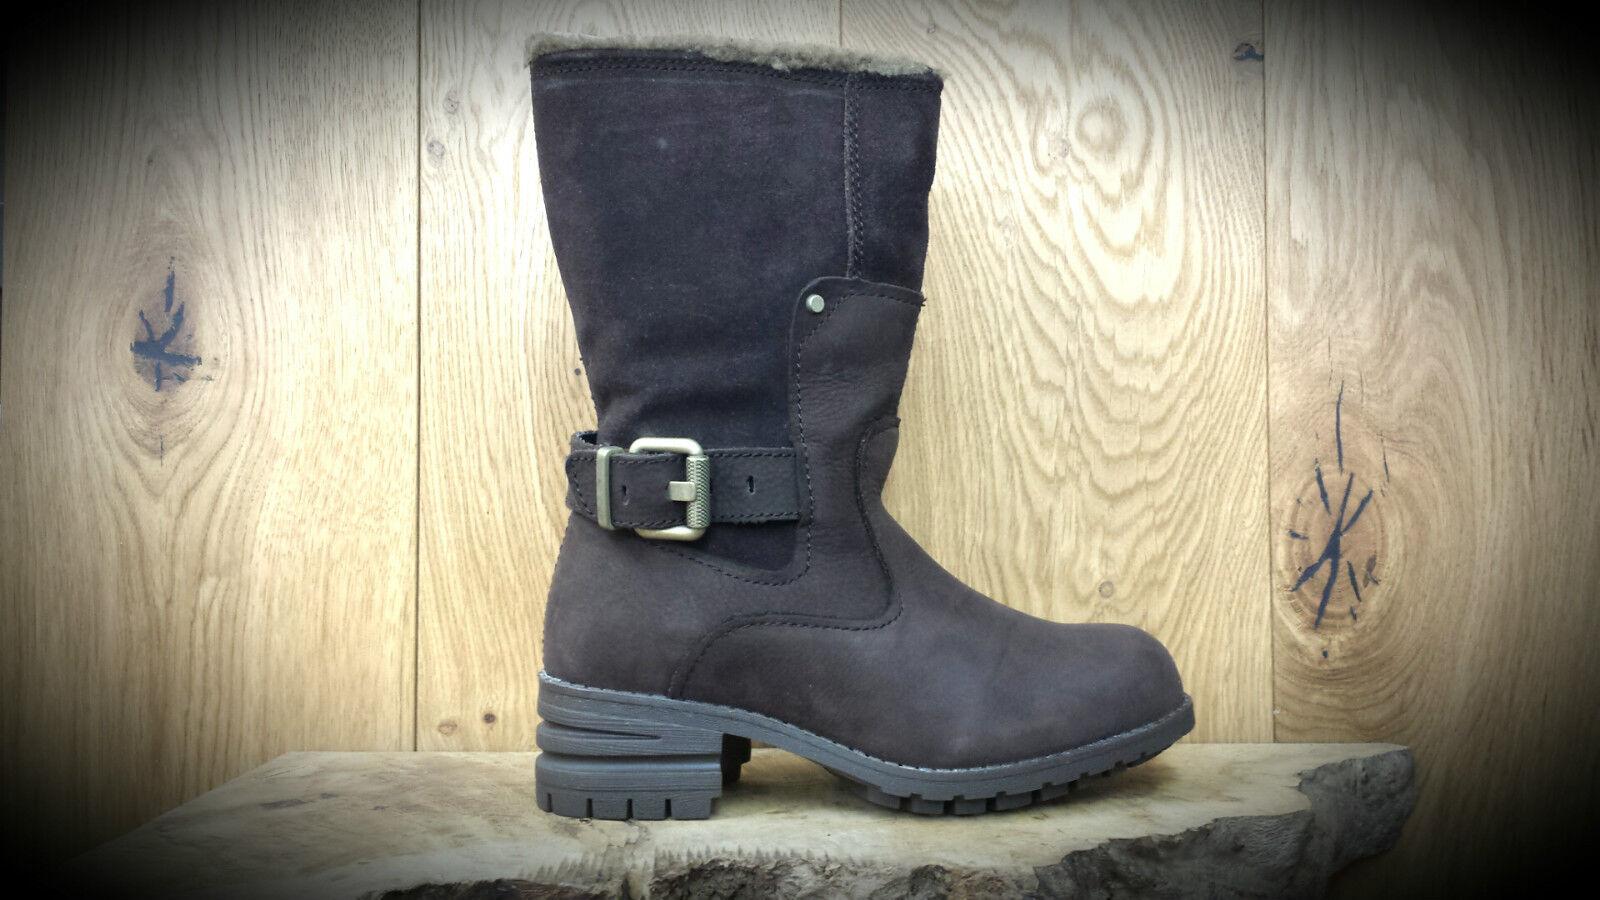 Grandes zapatos con descuento CAT // Caterpillar // Randi // Brown Calf Winter Boots // REDUCED Was 125.00